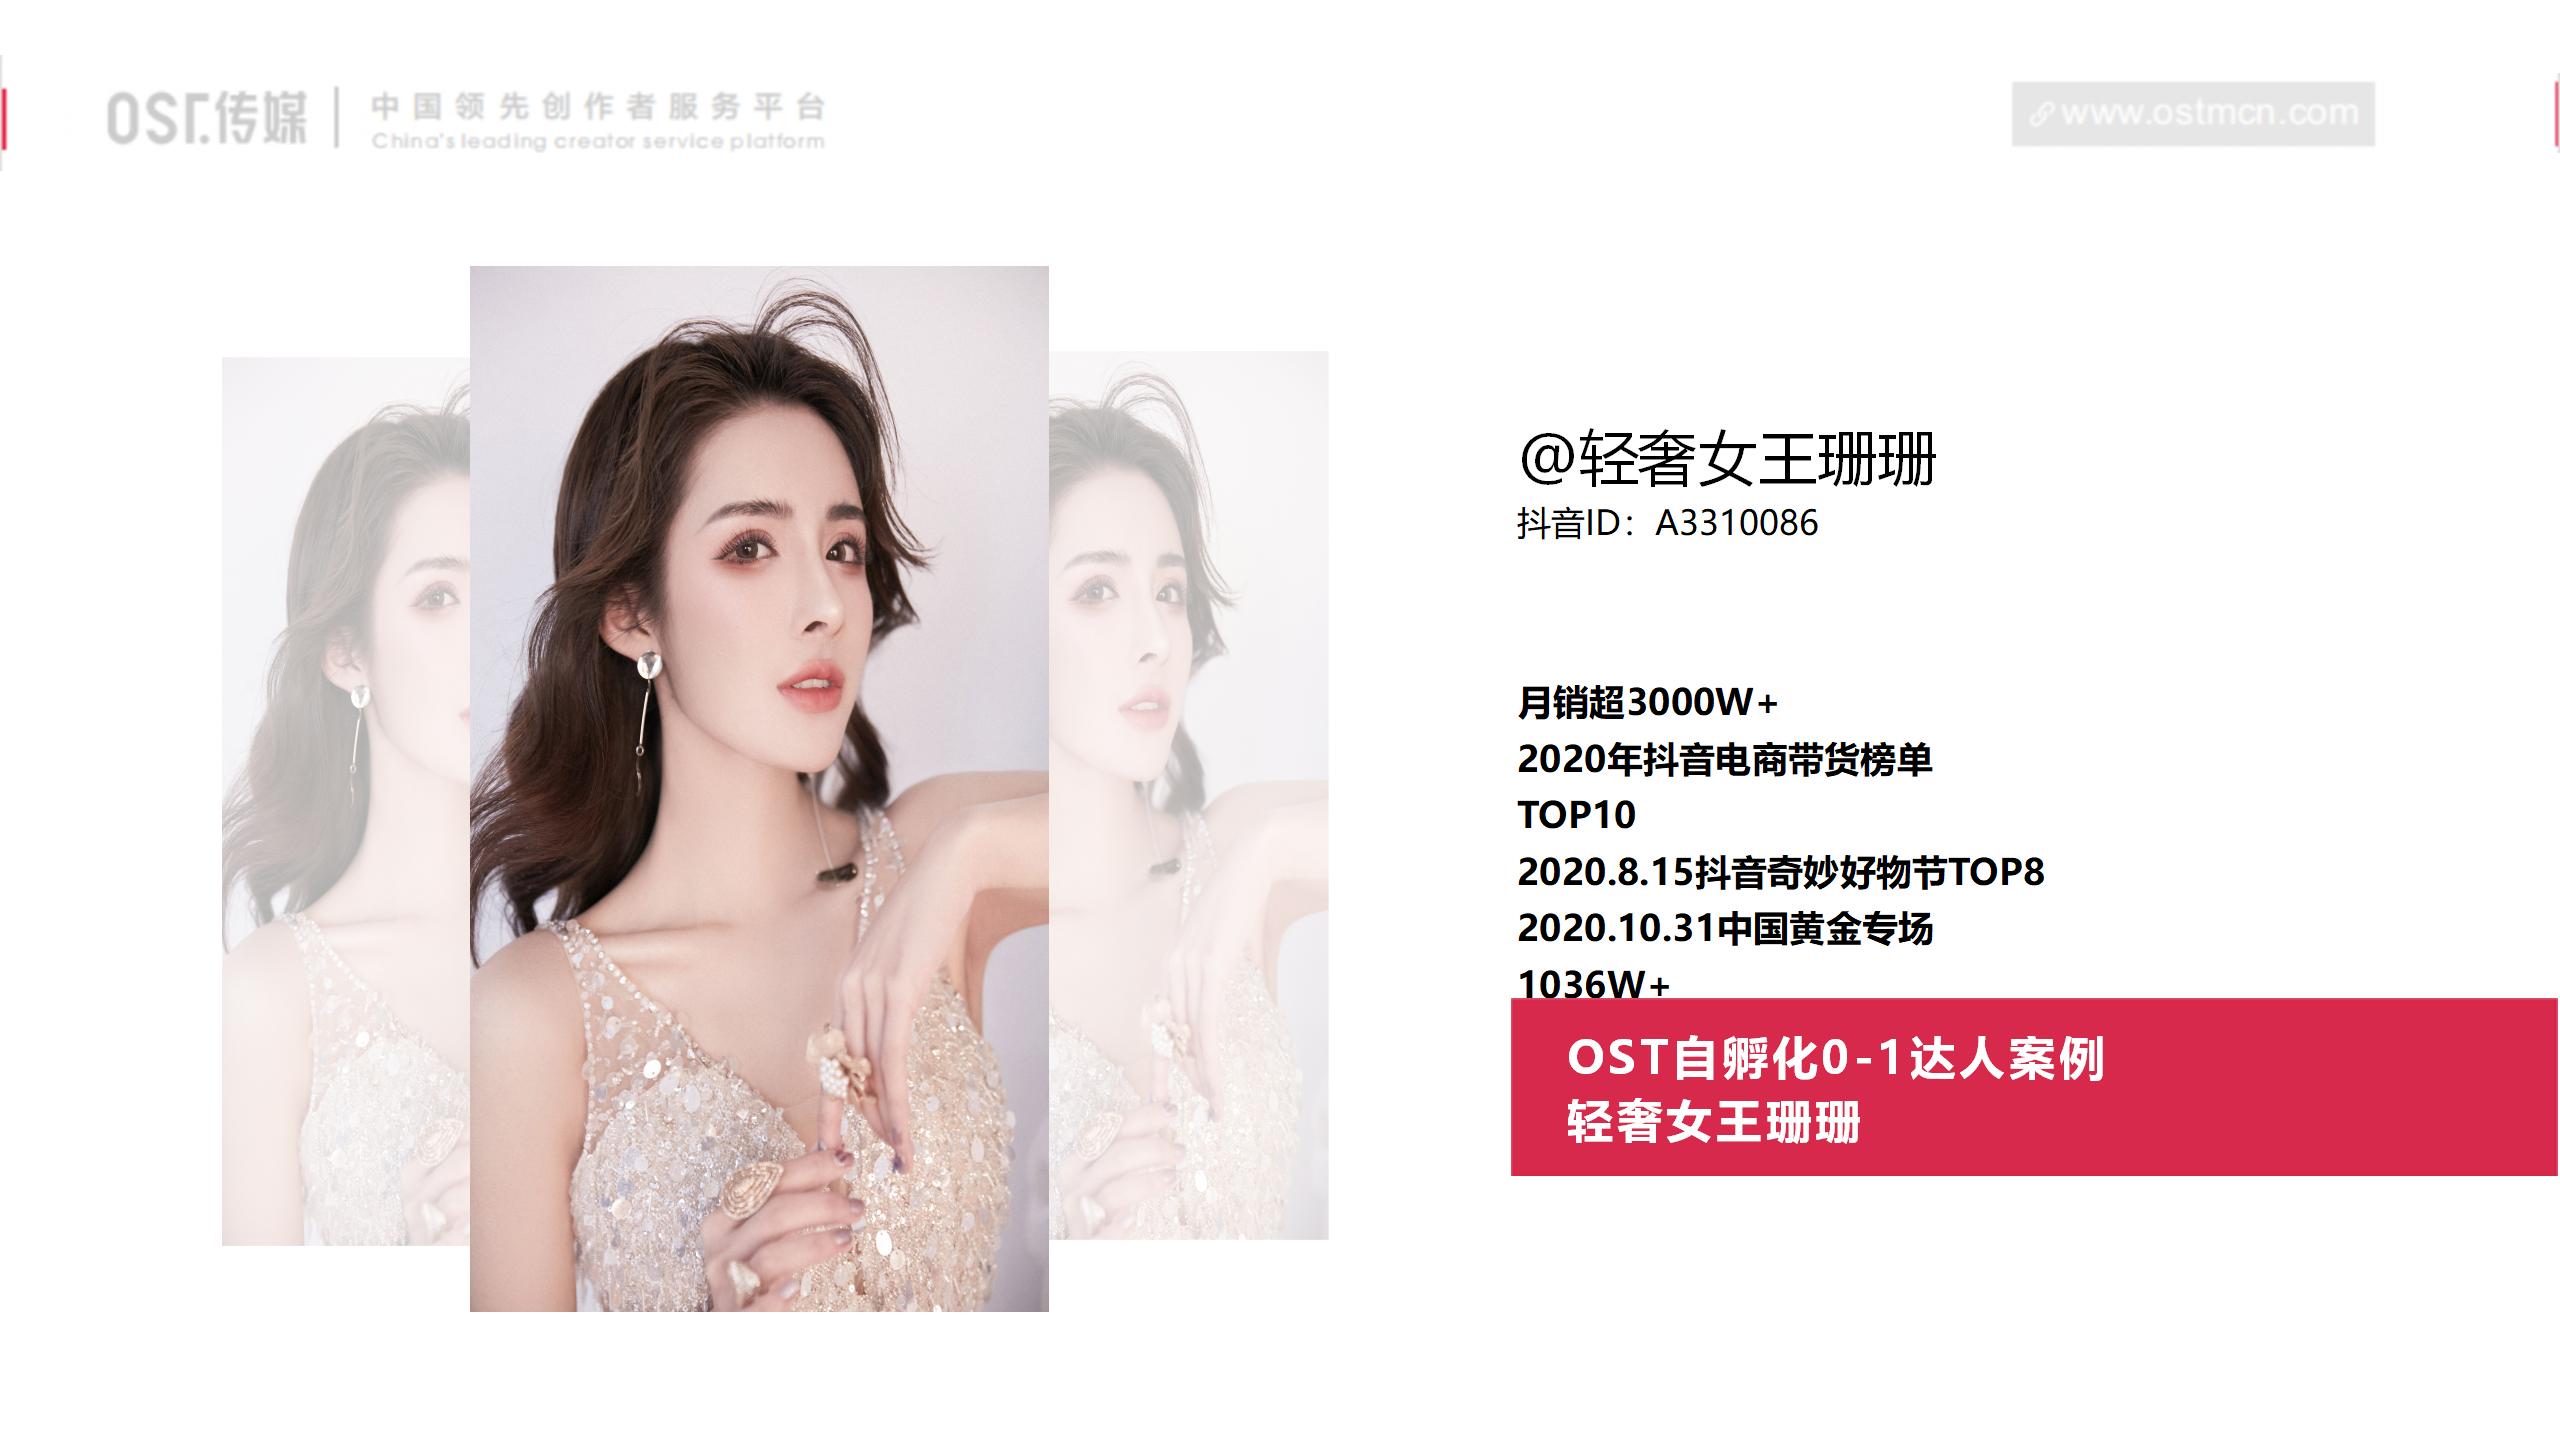 OST传媒电商业务介绍第25张